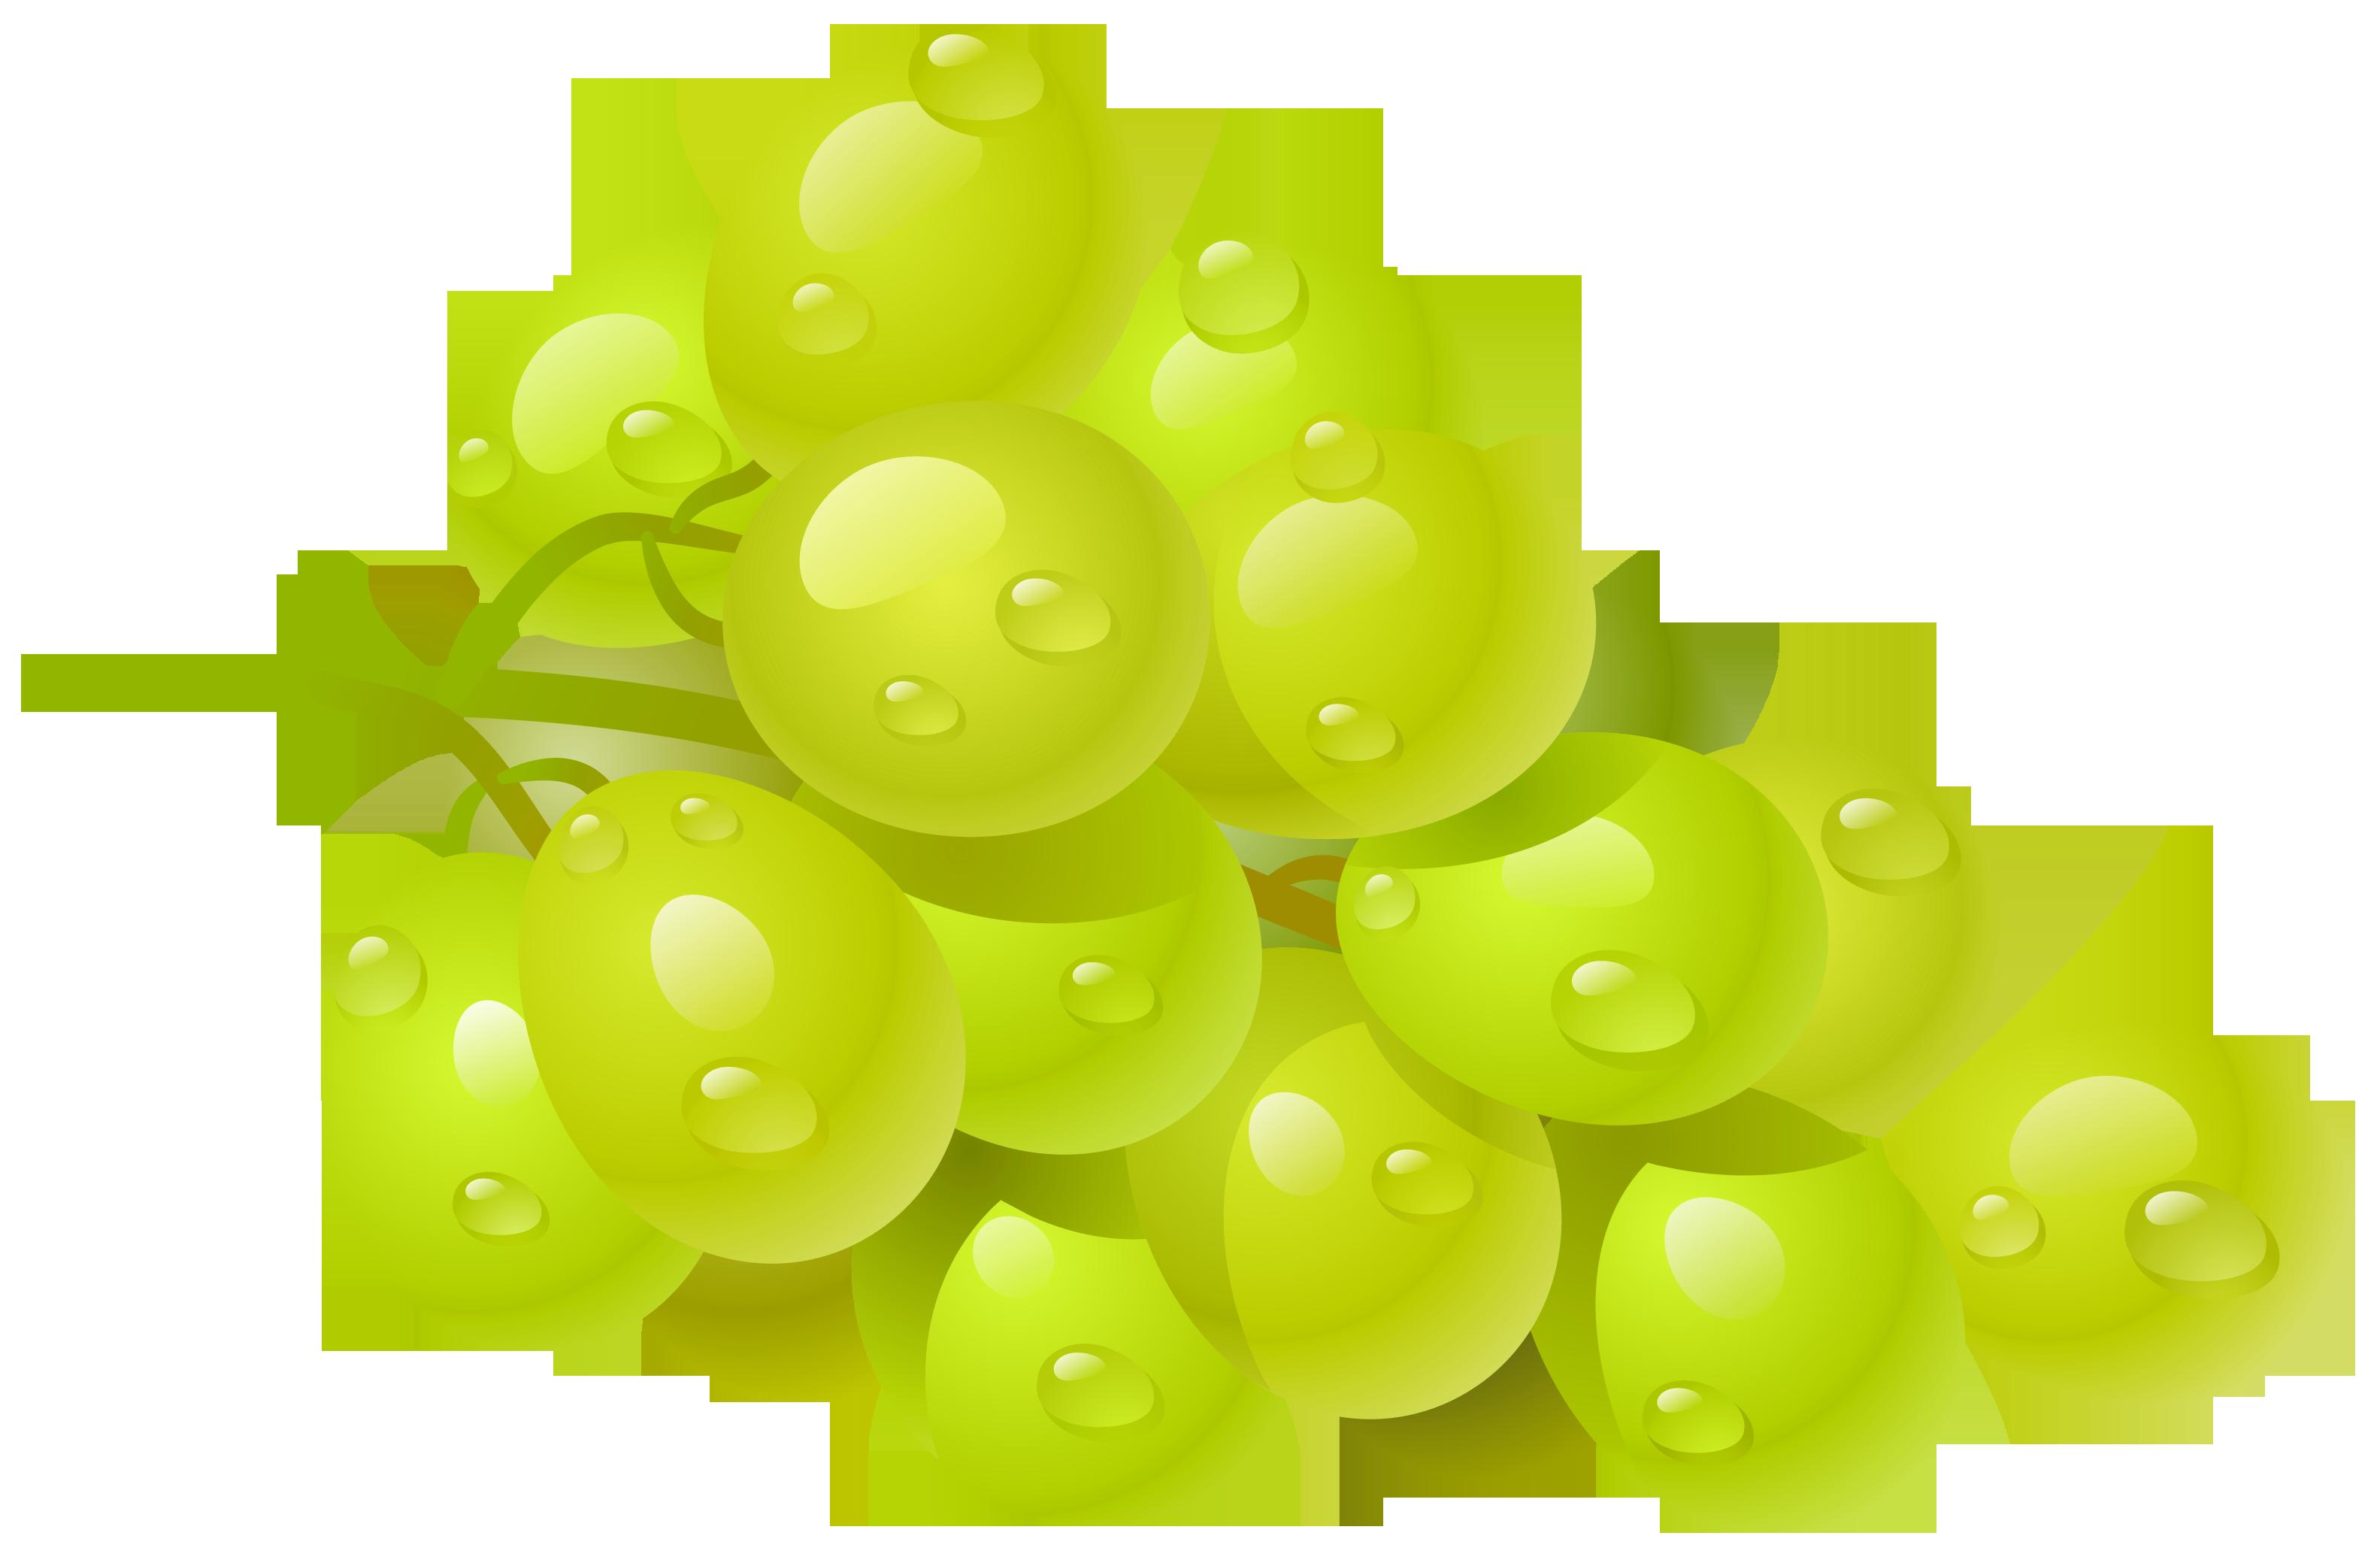 Grapes clip art free clipart images imag-Grapes clip art free clipart images image-15